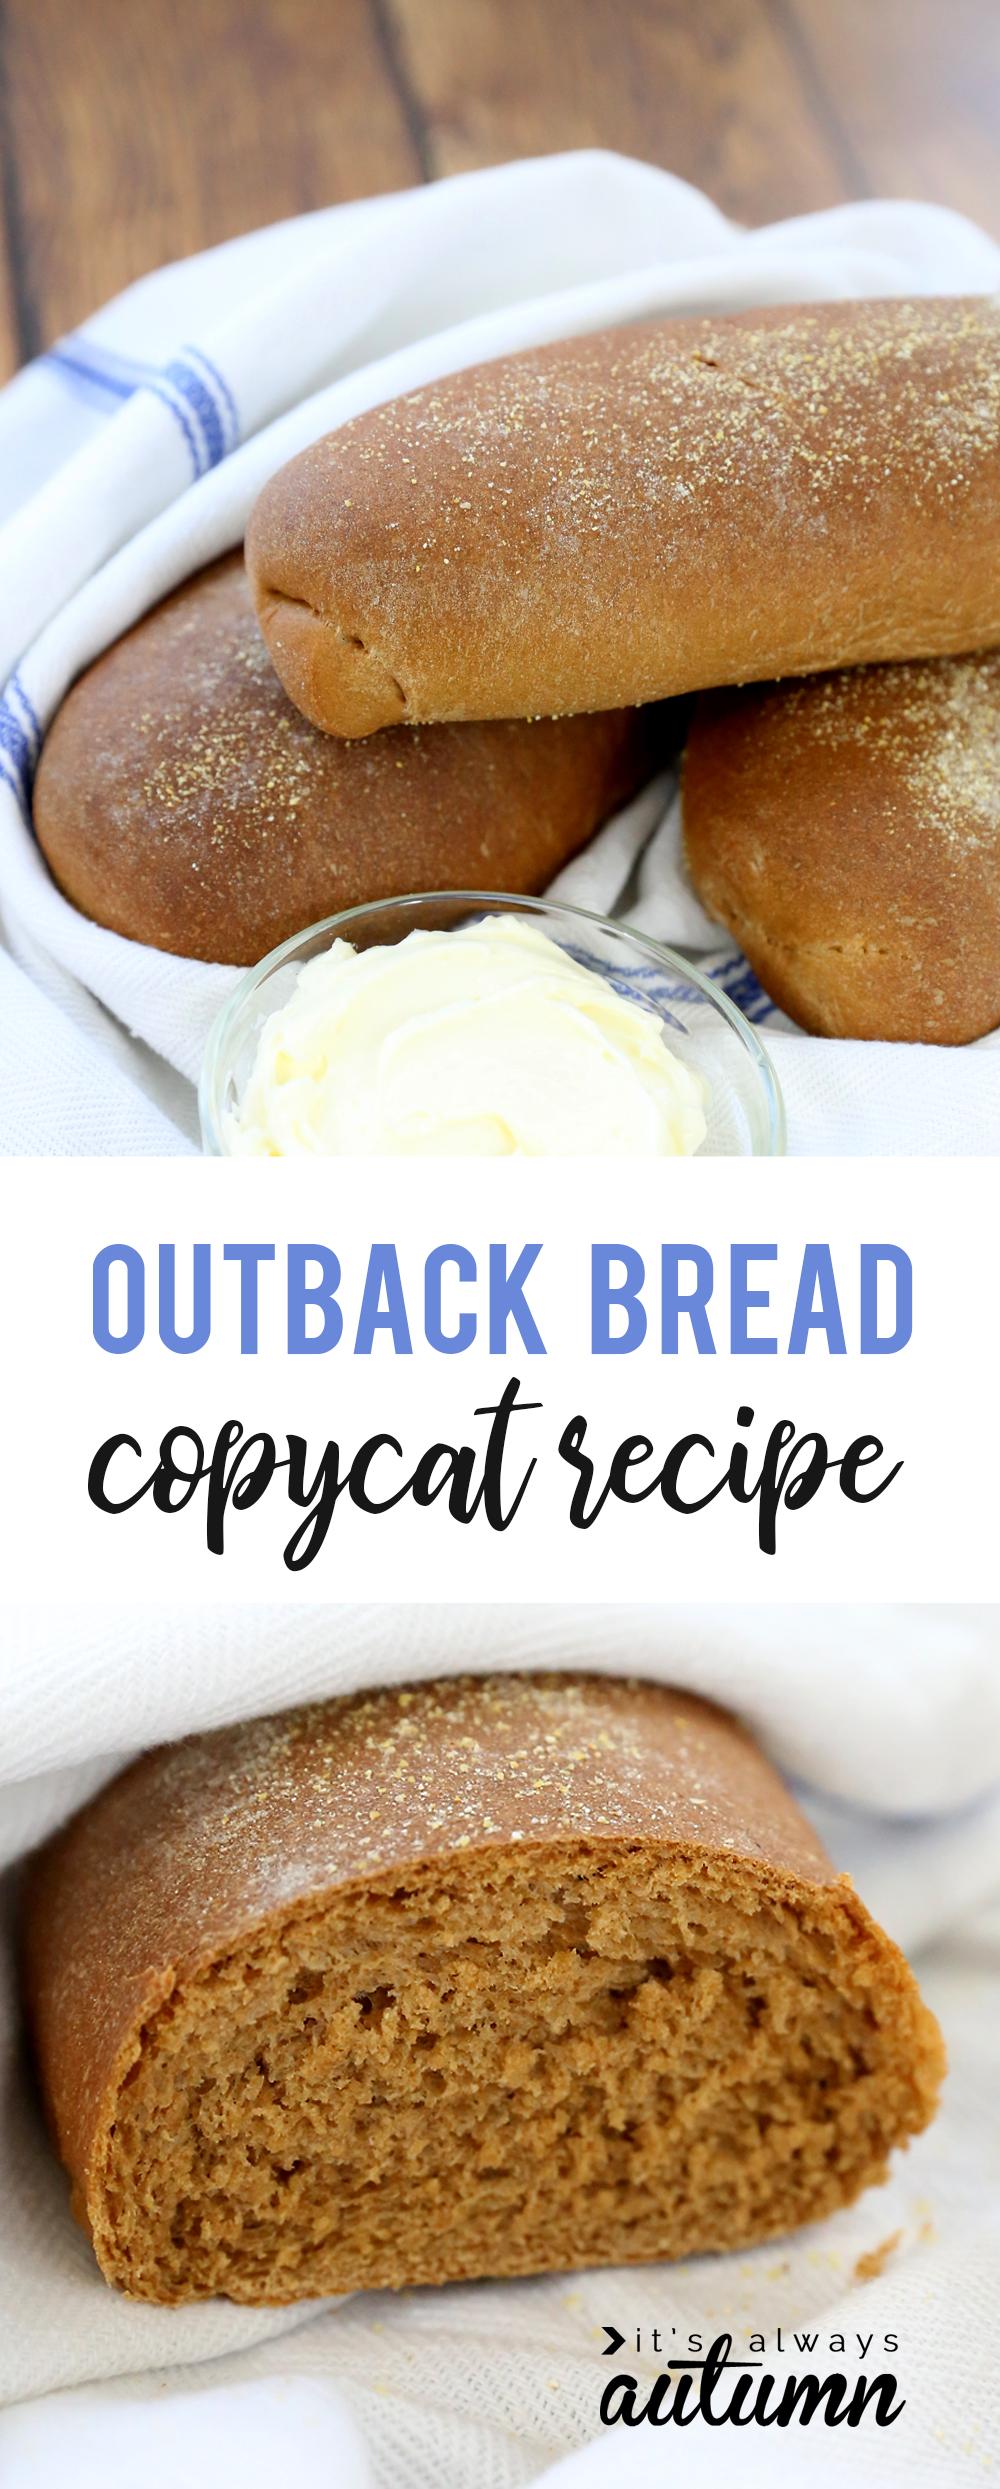 Copycat Outback brown bread